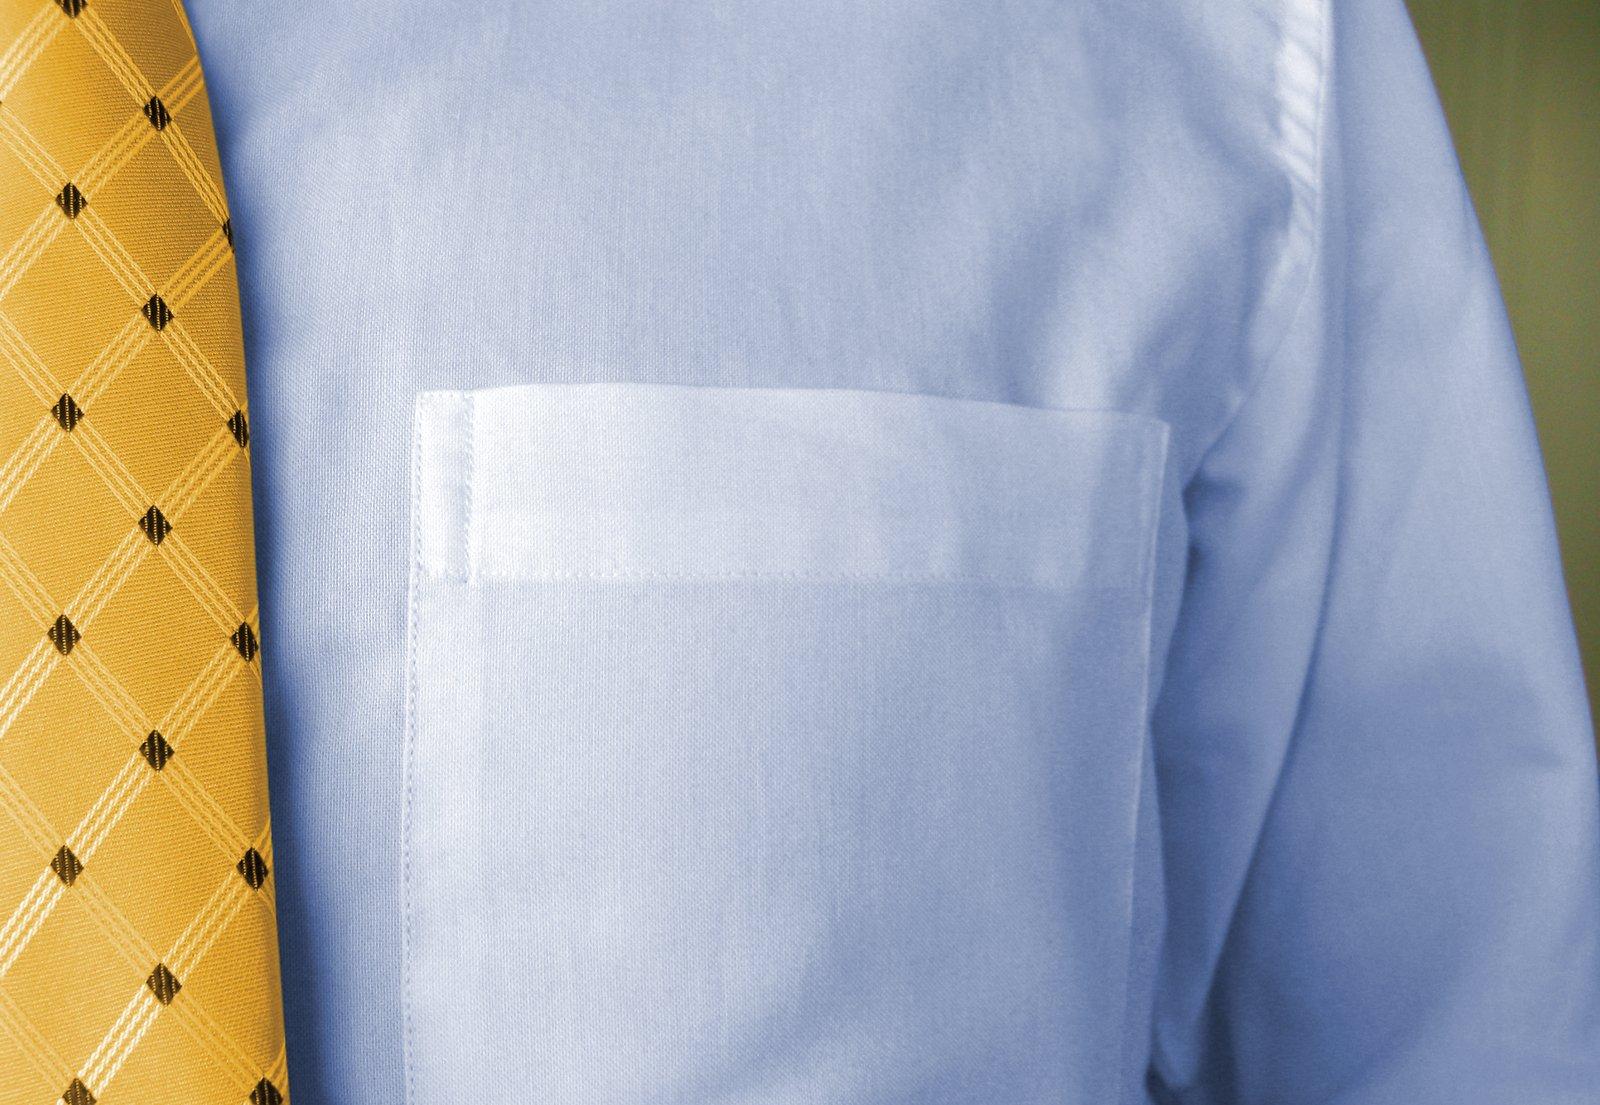 bílá košile a žlutá kravata